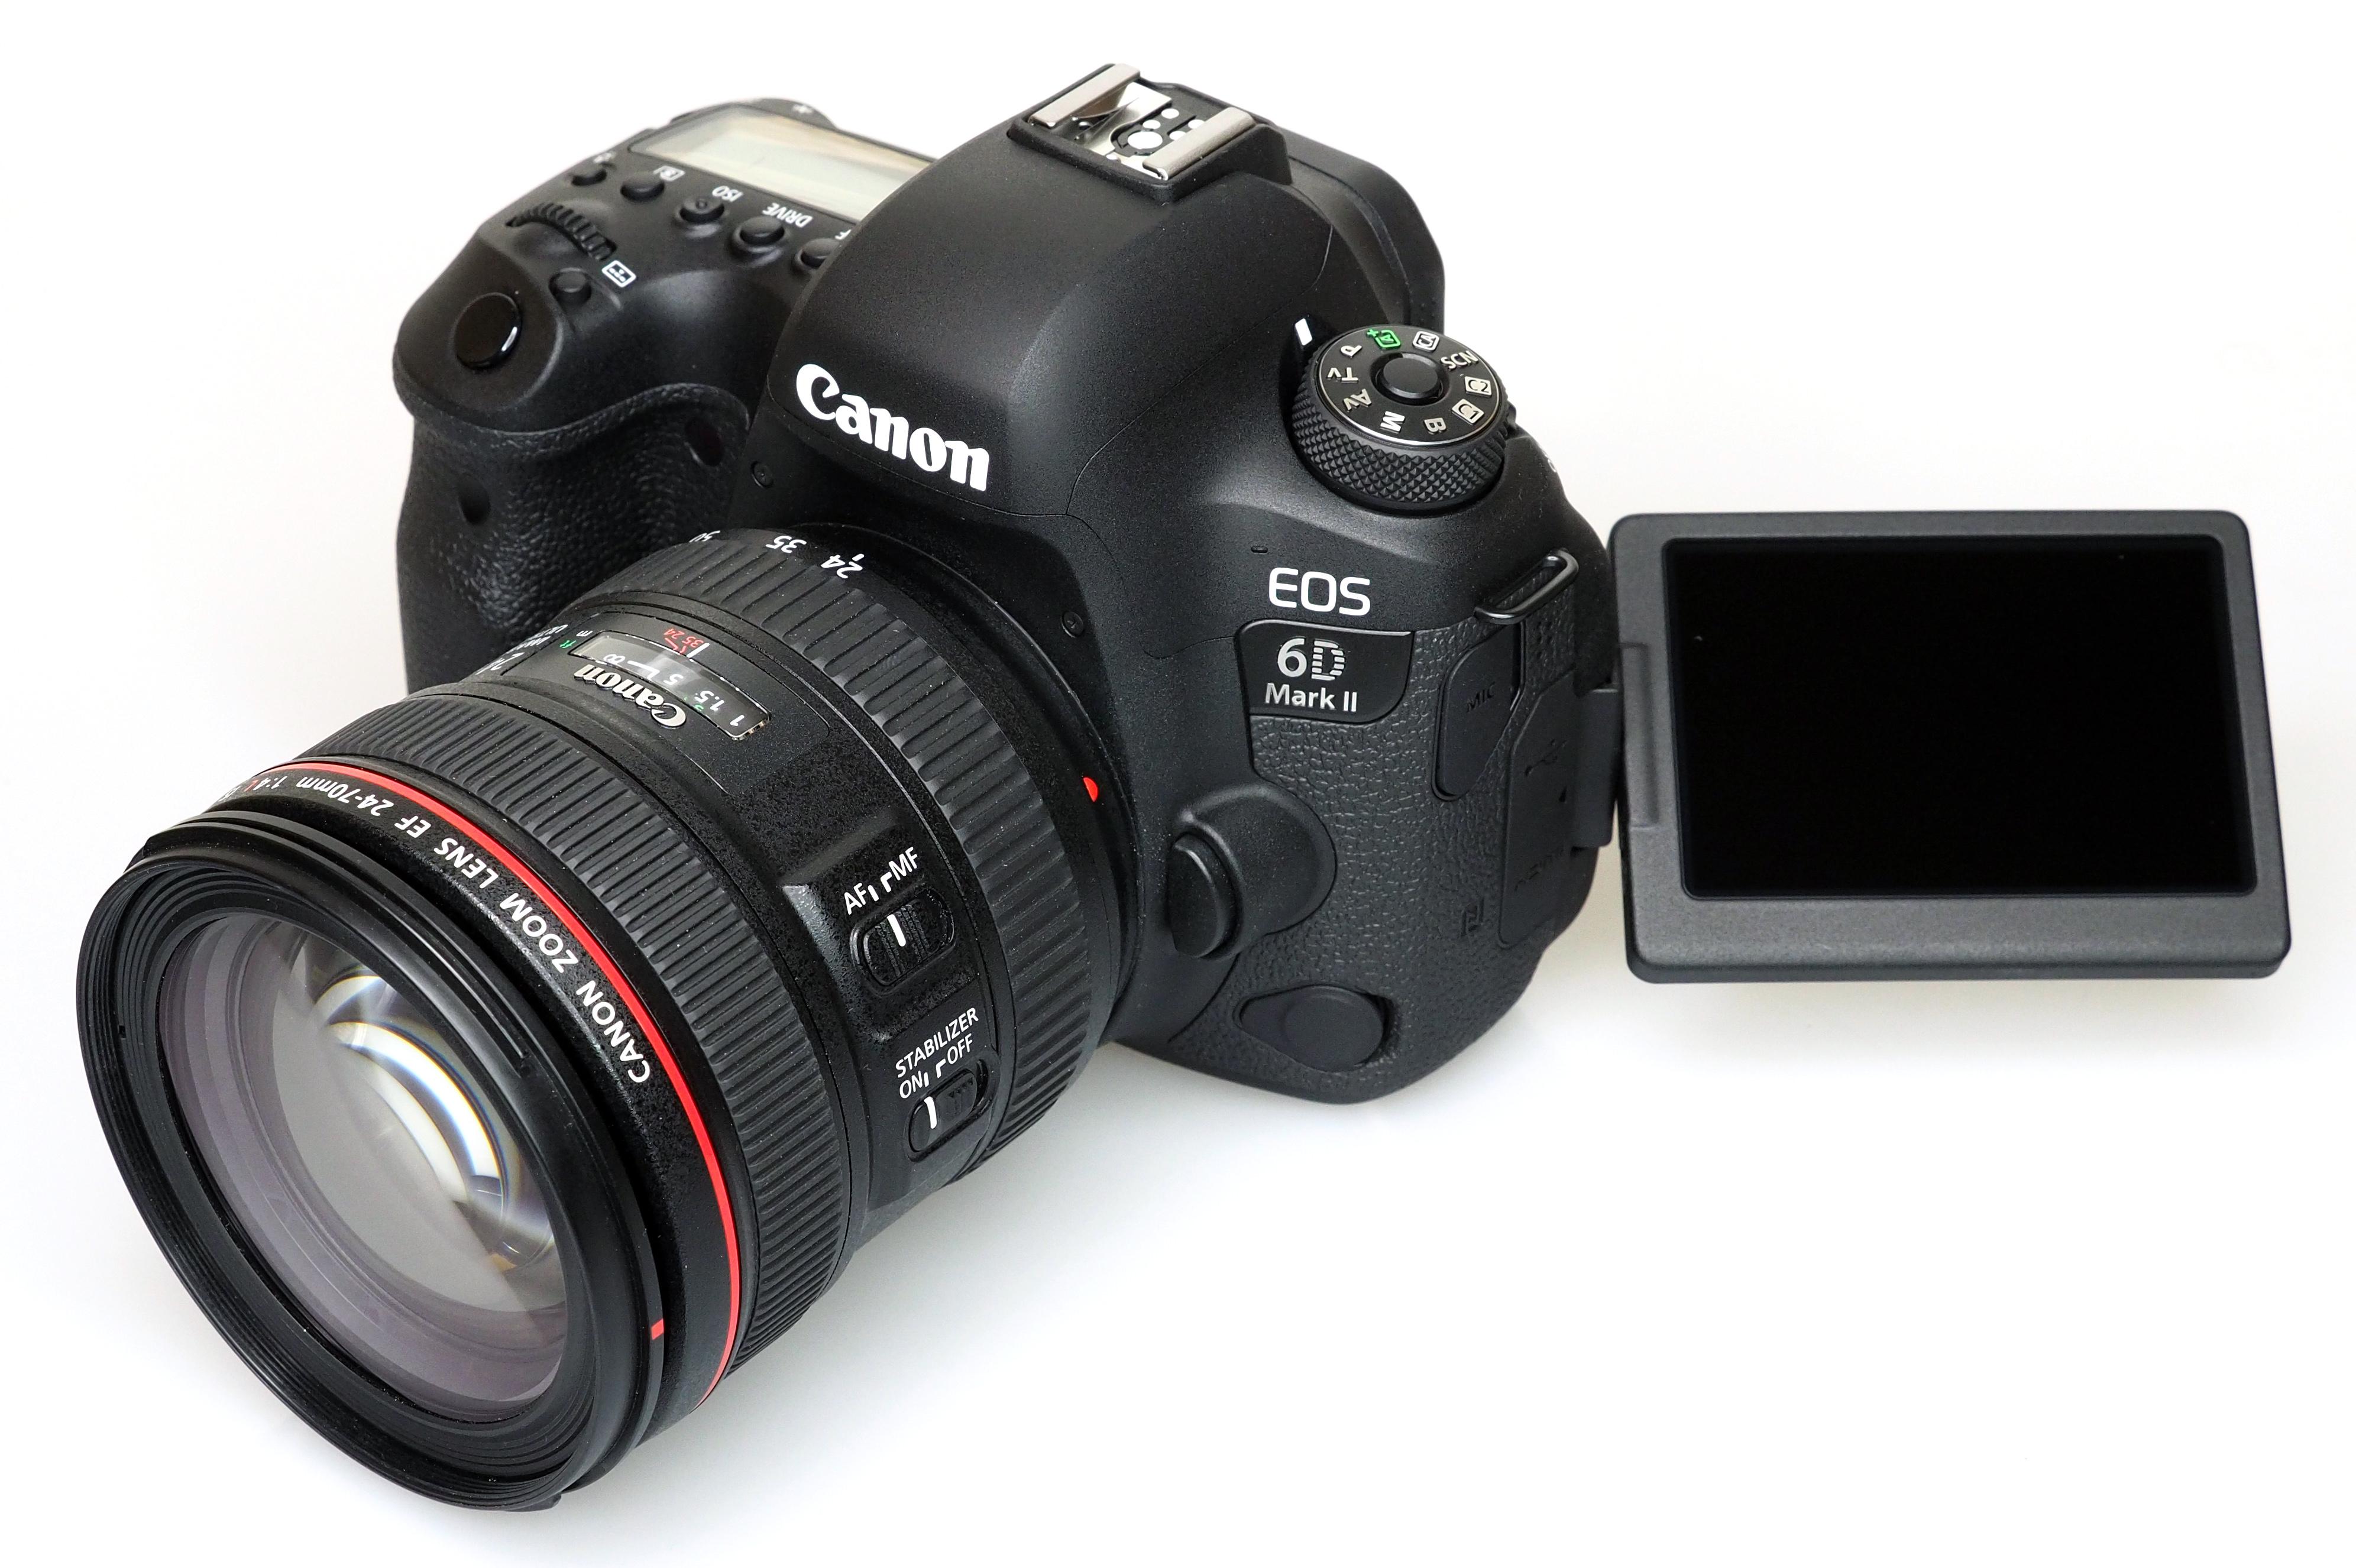 Exciting Canon Eos Mark Ii Features Canon Eos Mark Ii Expert Review Canon 6d Used Adorama Canon 6d Used Craigslist dpreview Canon 6d Used